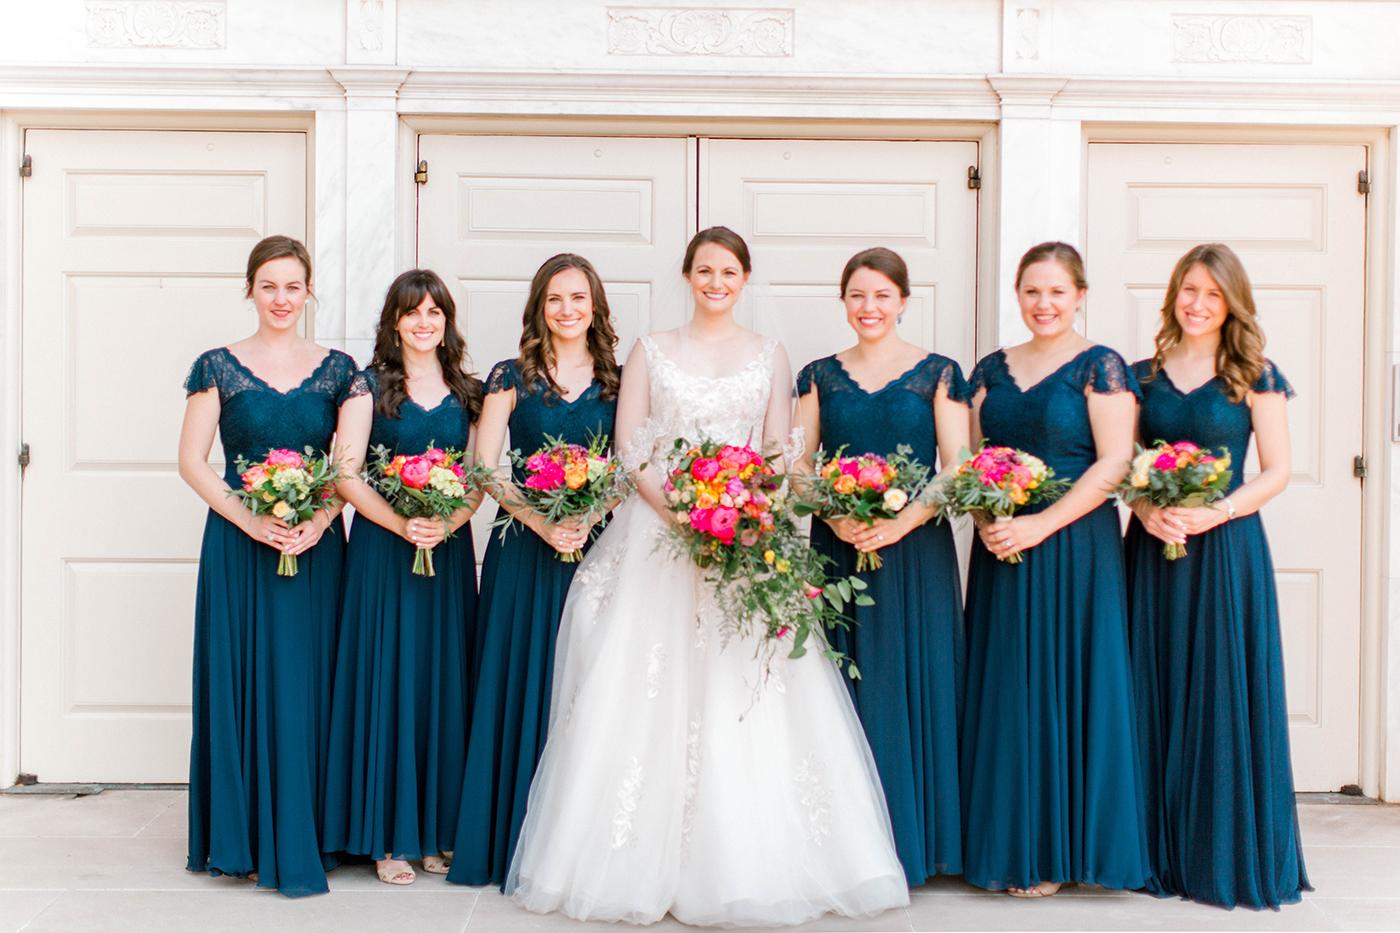 Dallas TX Wedding Planner - Allday Events - Hall on Dragon Wedding - 00001.jpg